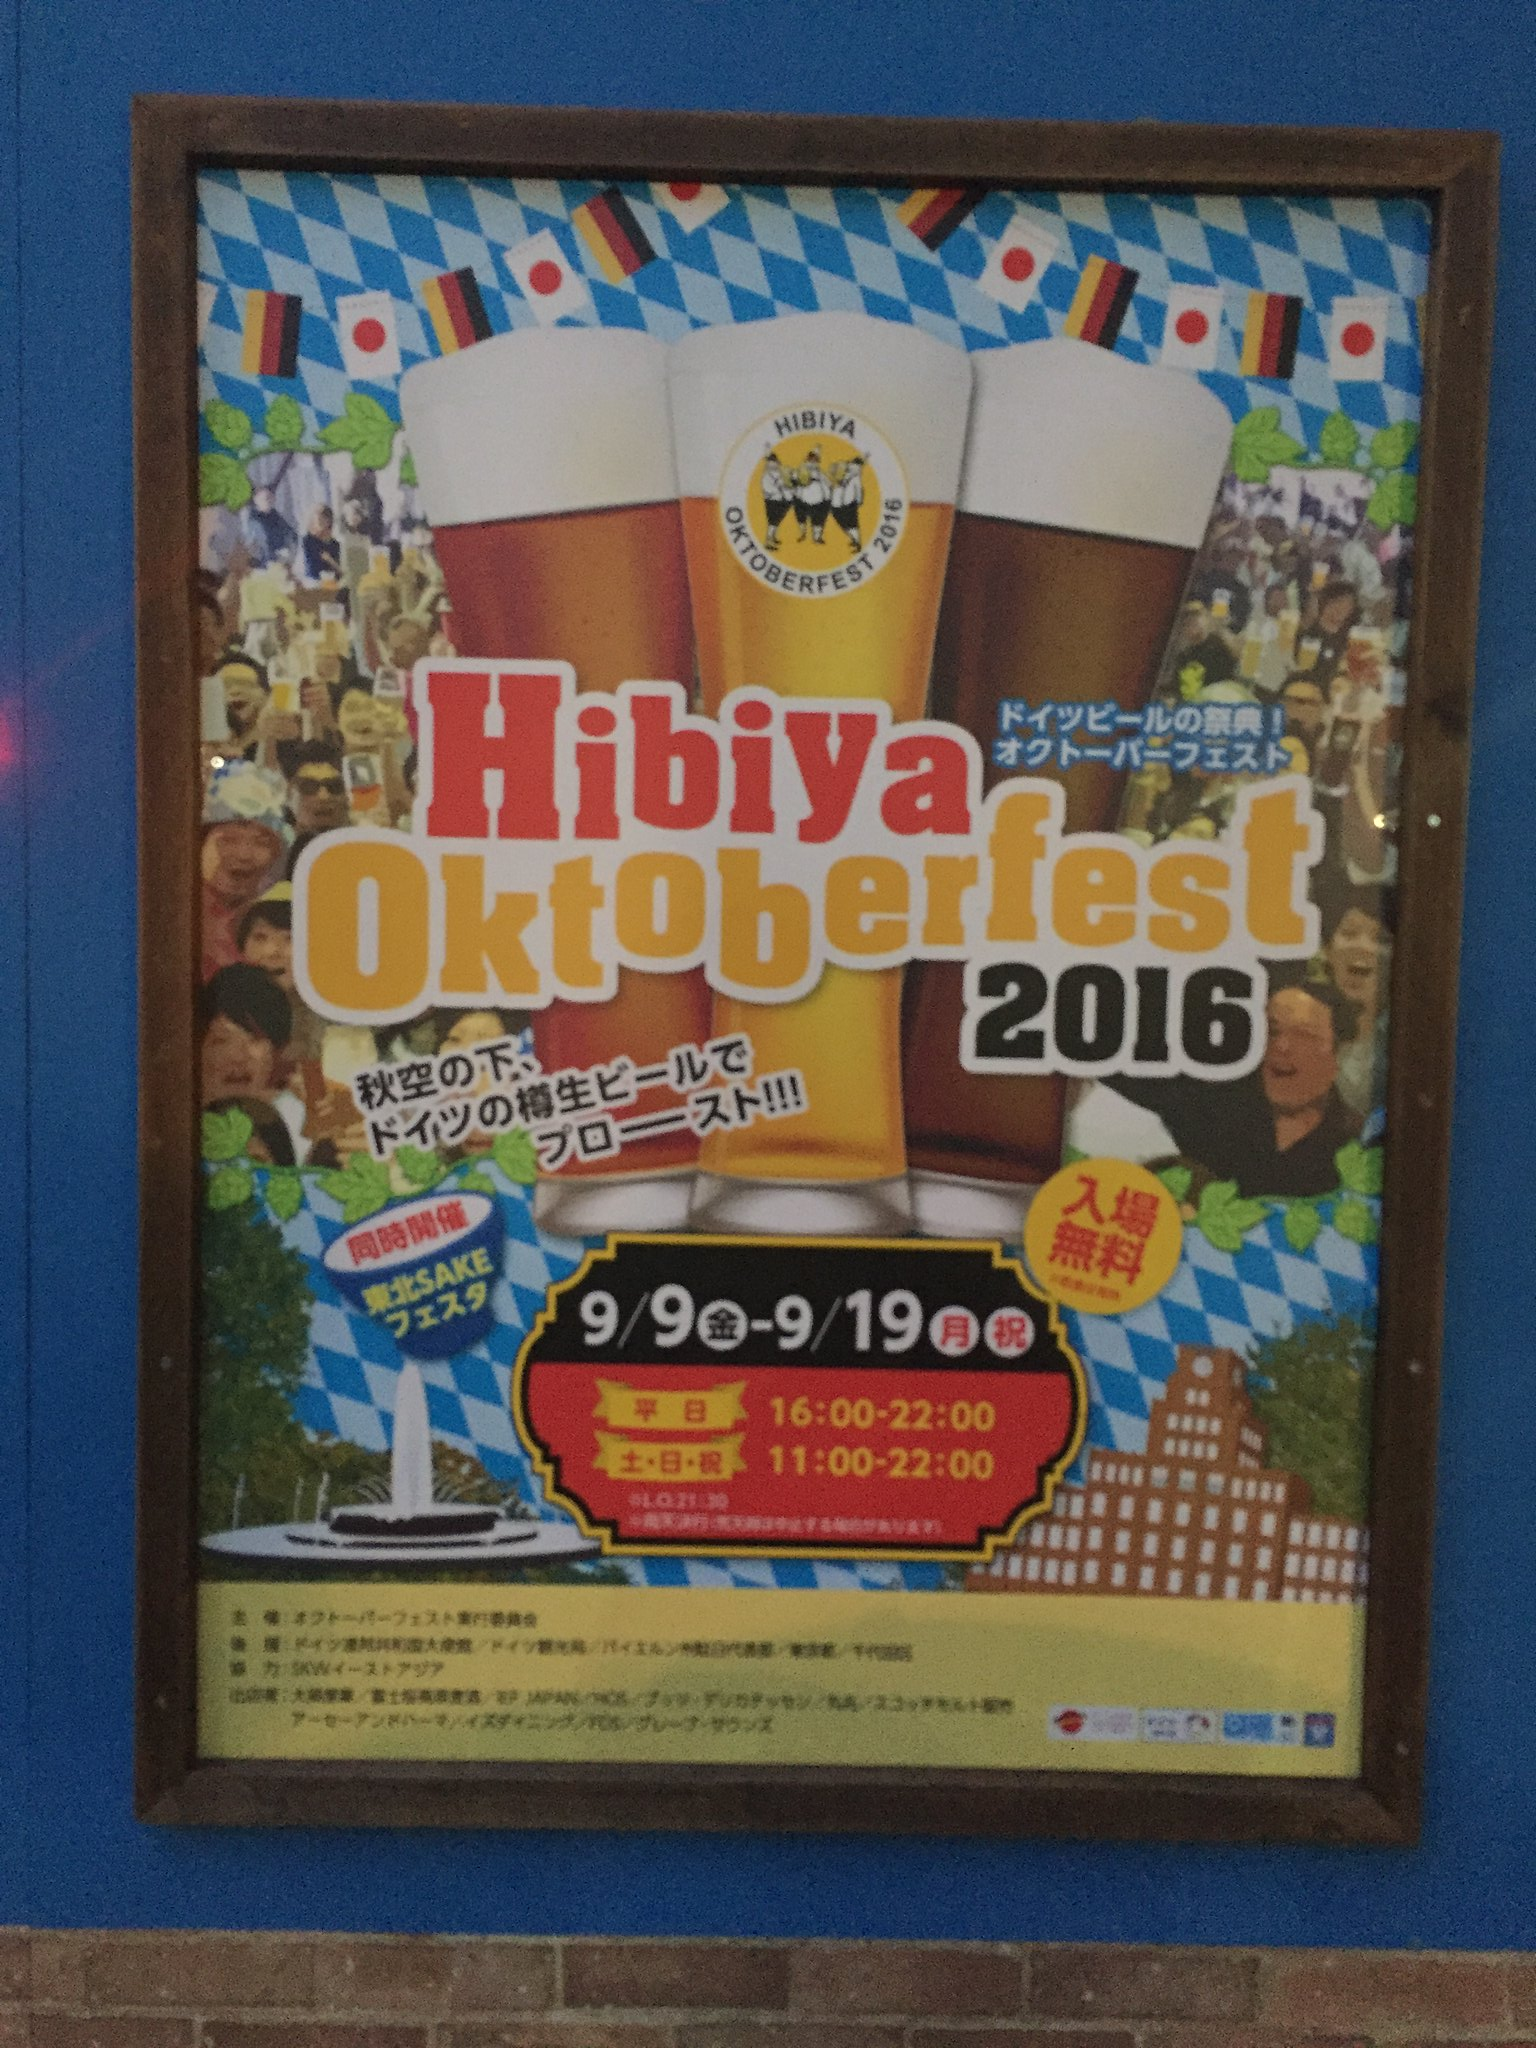 Oktoberfest i Japan